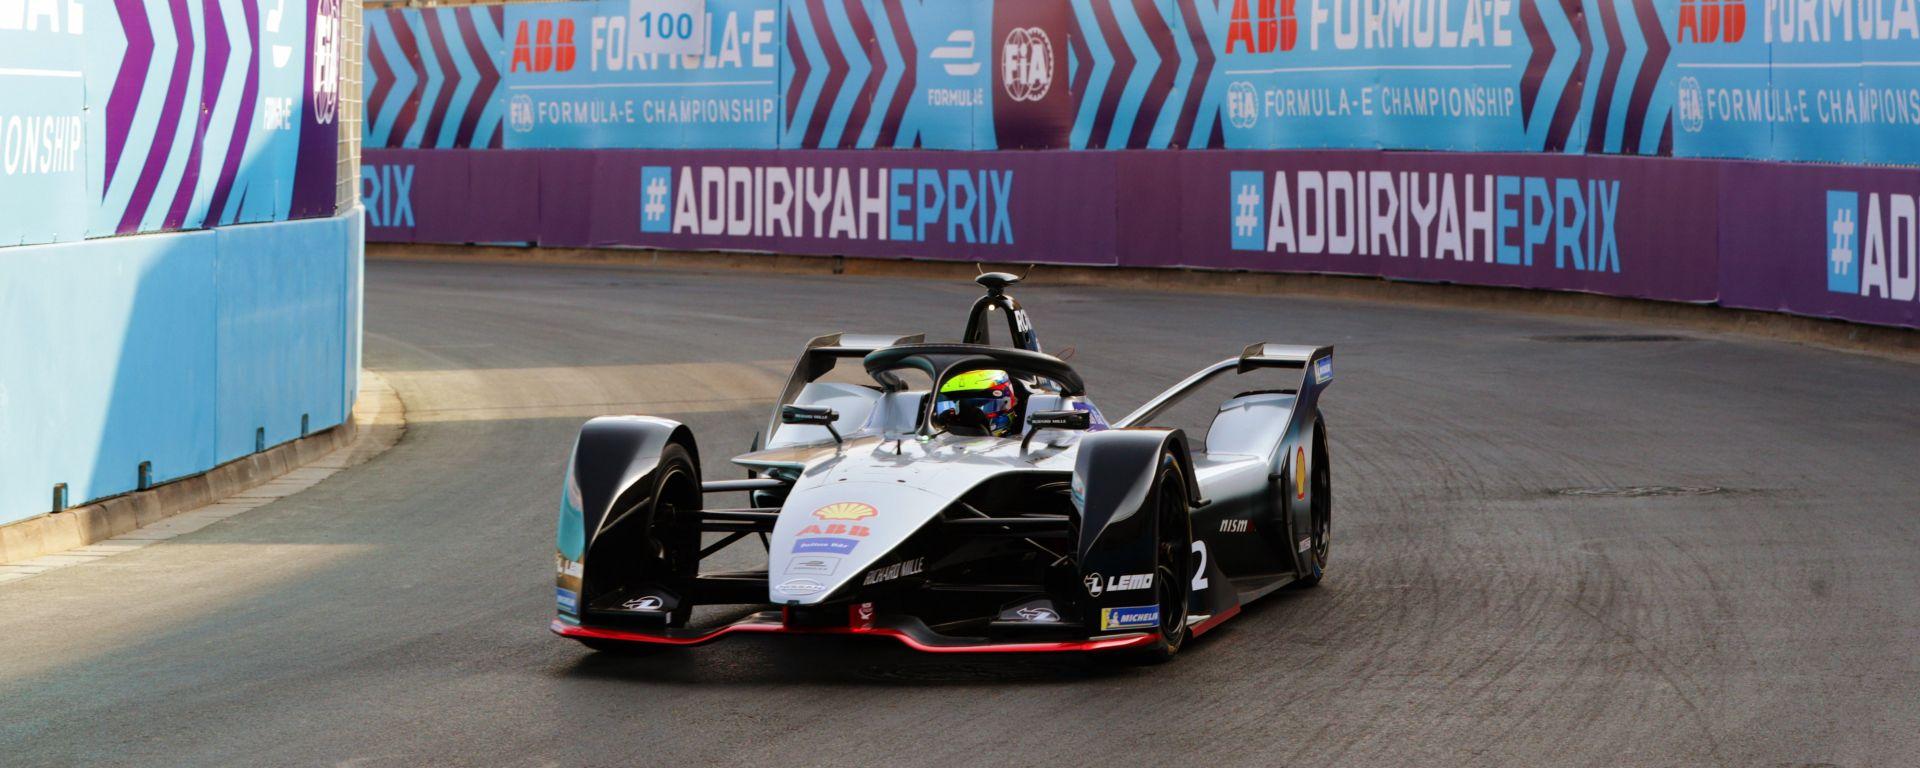 ePrix Riad 2020